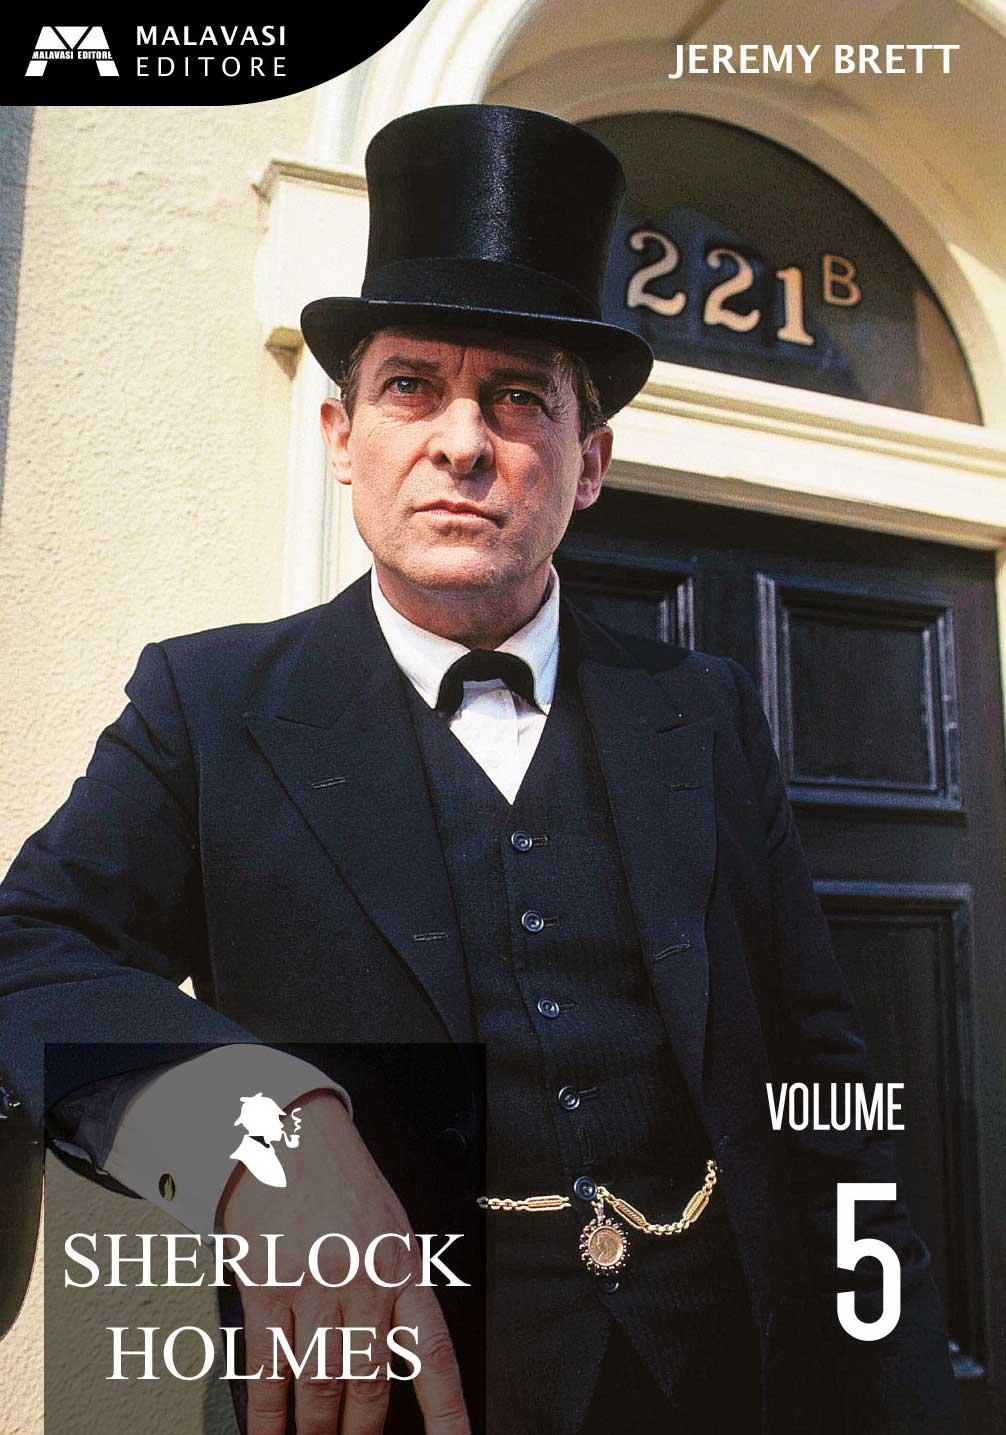 COF.SHERLOCK HOLMES #05 (2 DVD) (DVD)